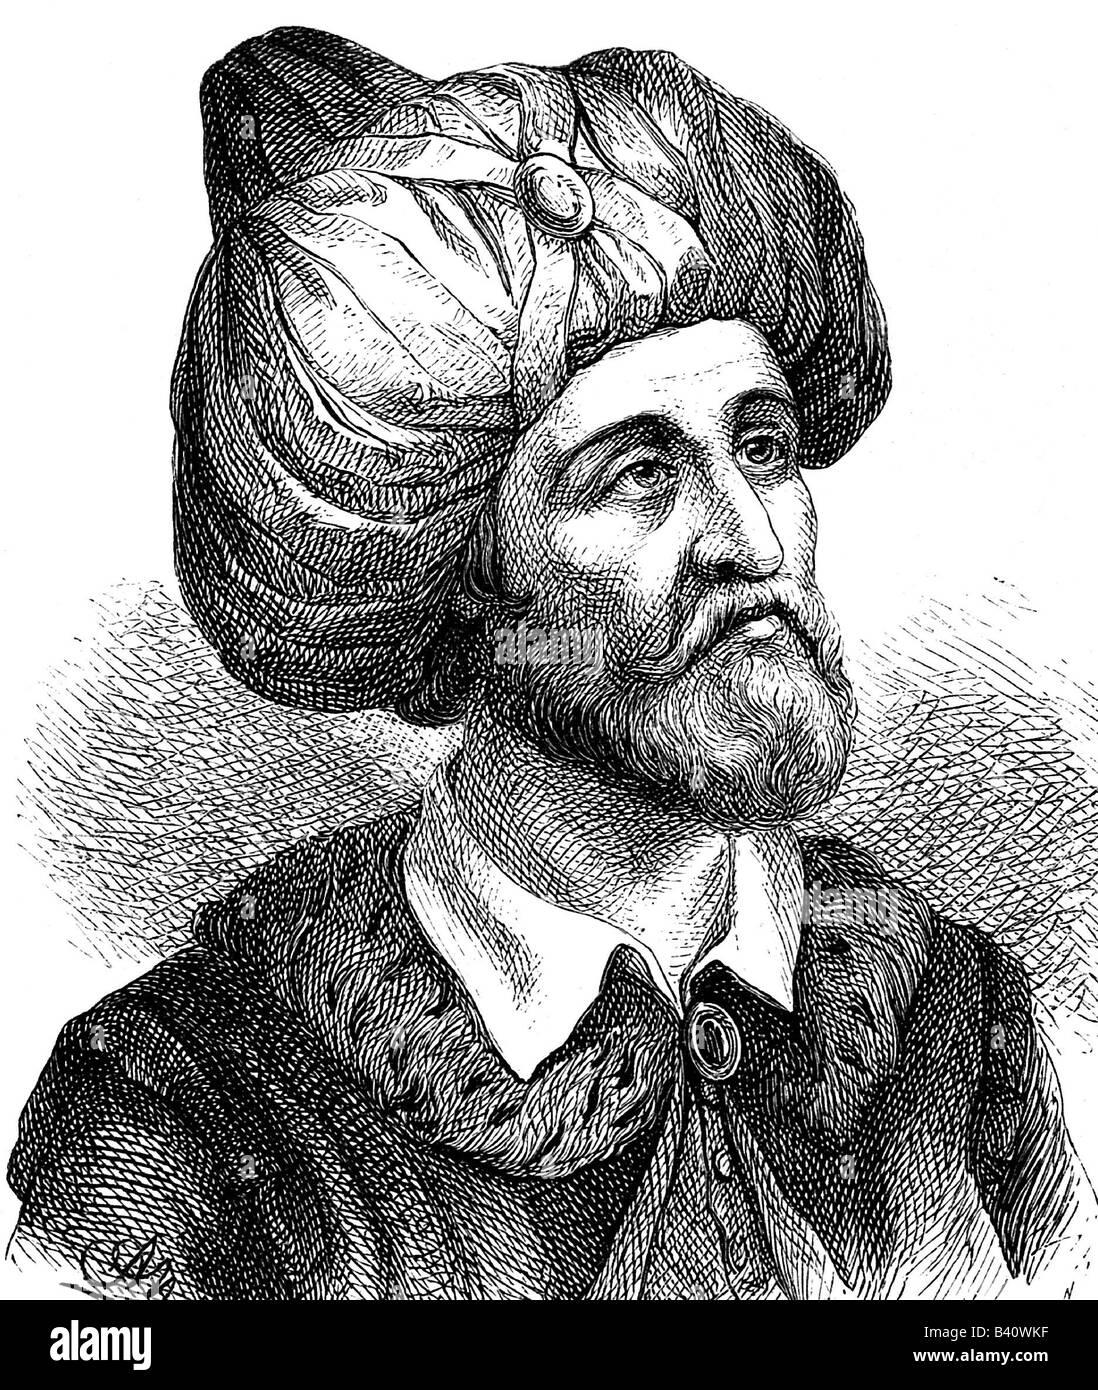 Muhammad (Abu al Kasim Muhammad ibn Abdallah), circa 570 - 8.6.632, Arabian Prophet, founder of Islam, portrait, engraving, 19th century, religion, , Additional-Rights-Clearances-NA